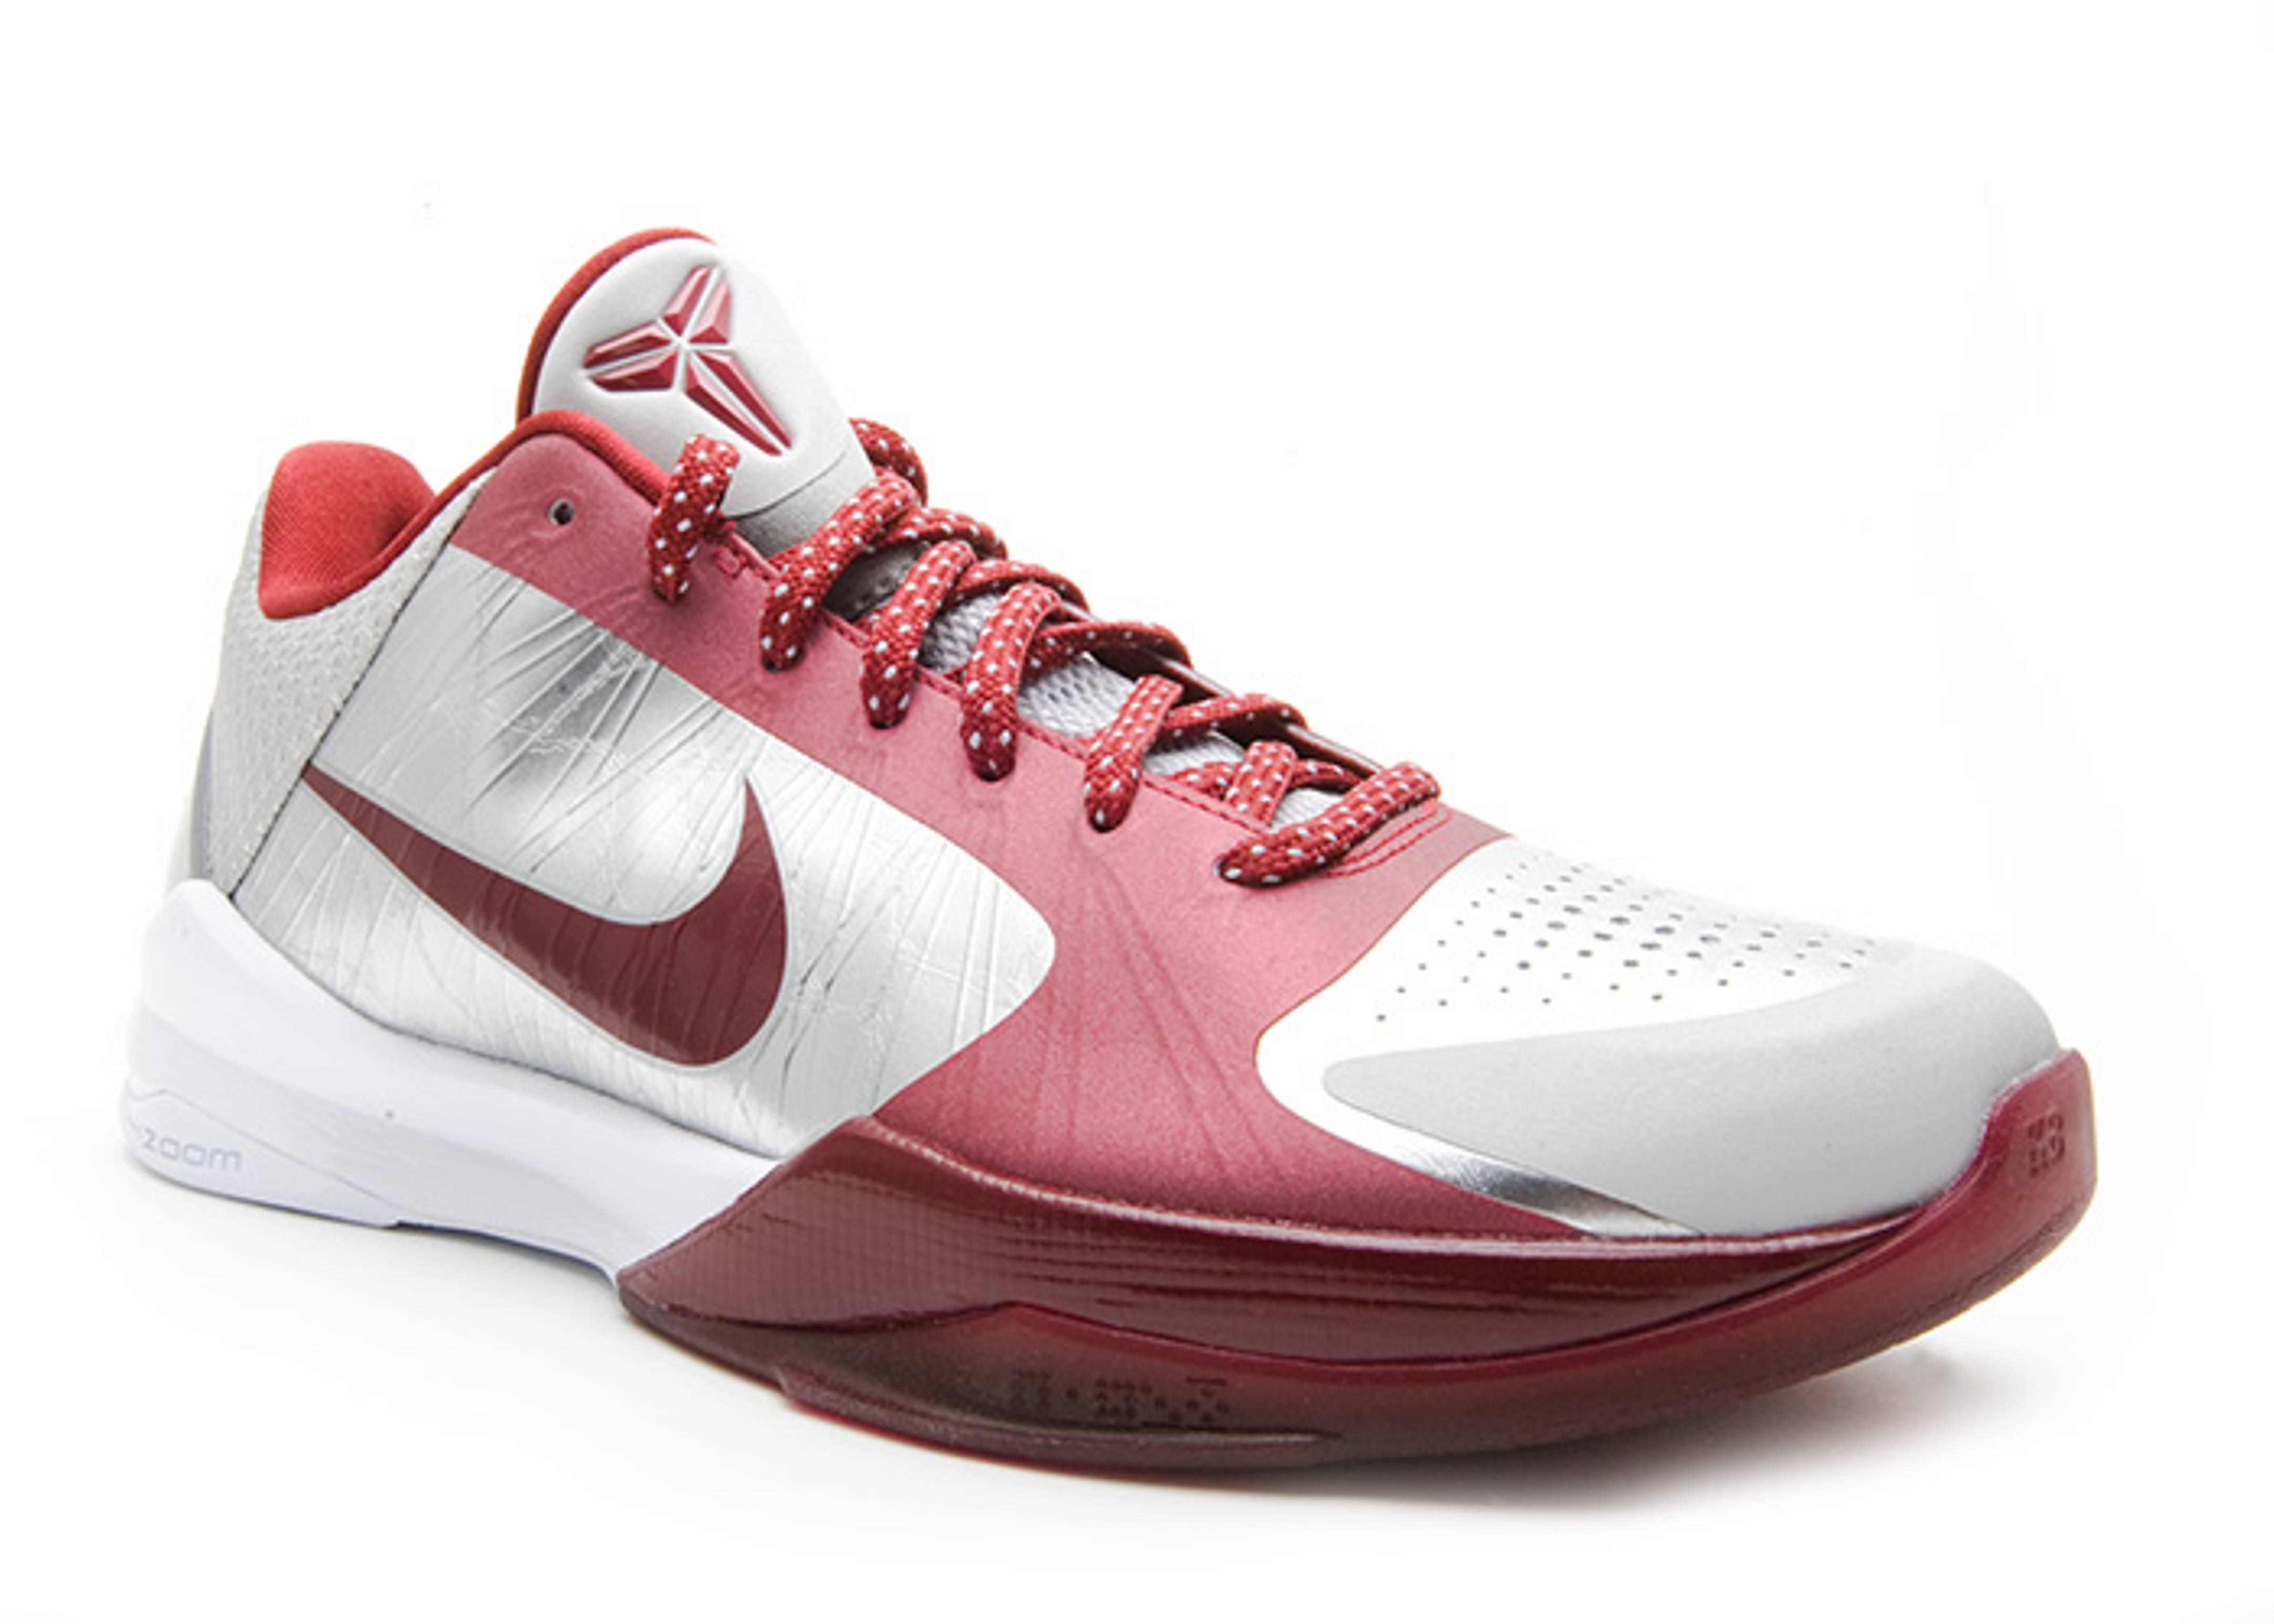 4f32f3693a61 ... zoom kobe 5 zoom kobe 6 Nike Kobe 11 EM Lower Merion ...